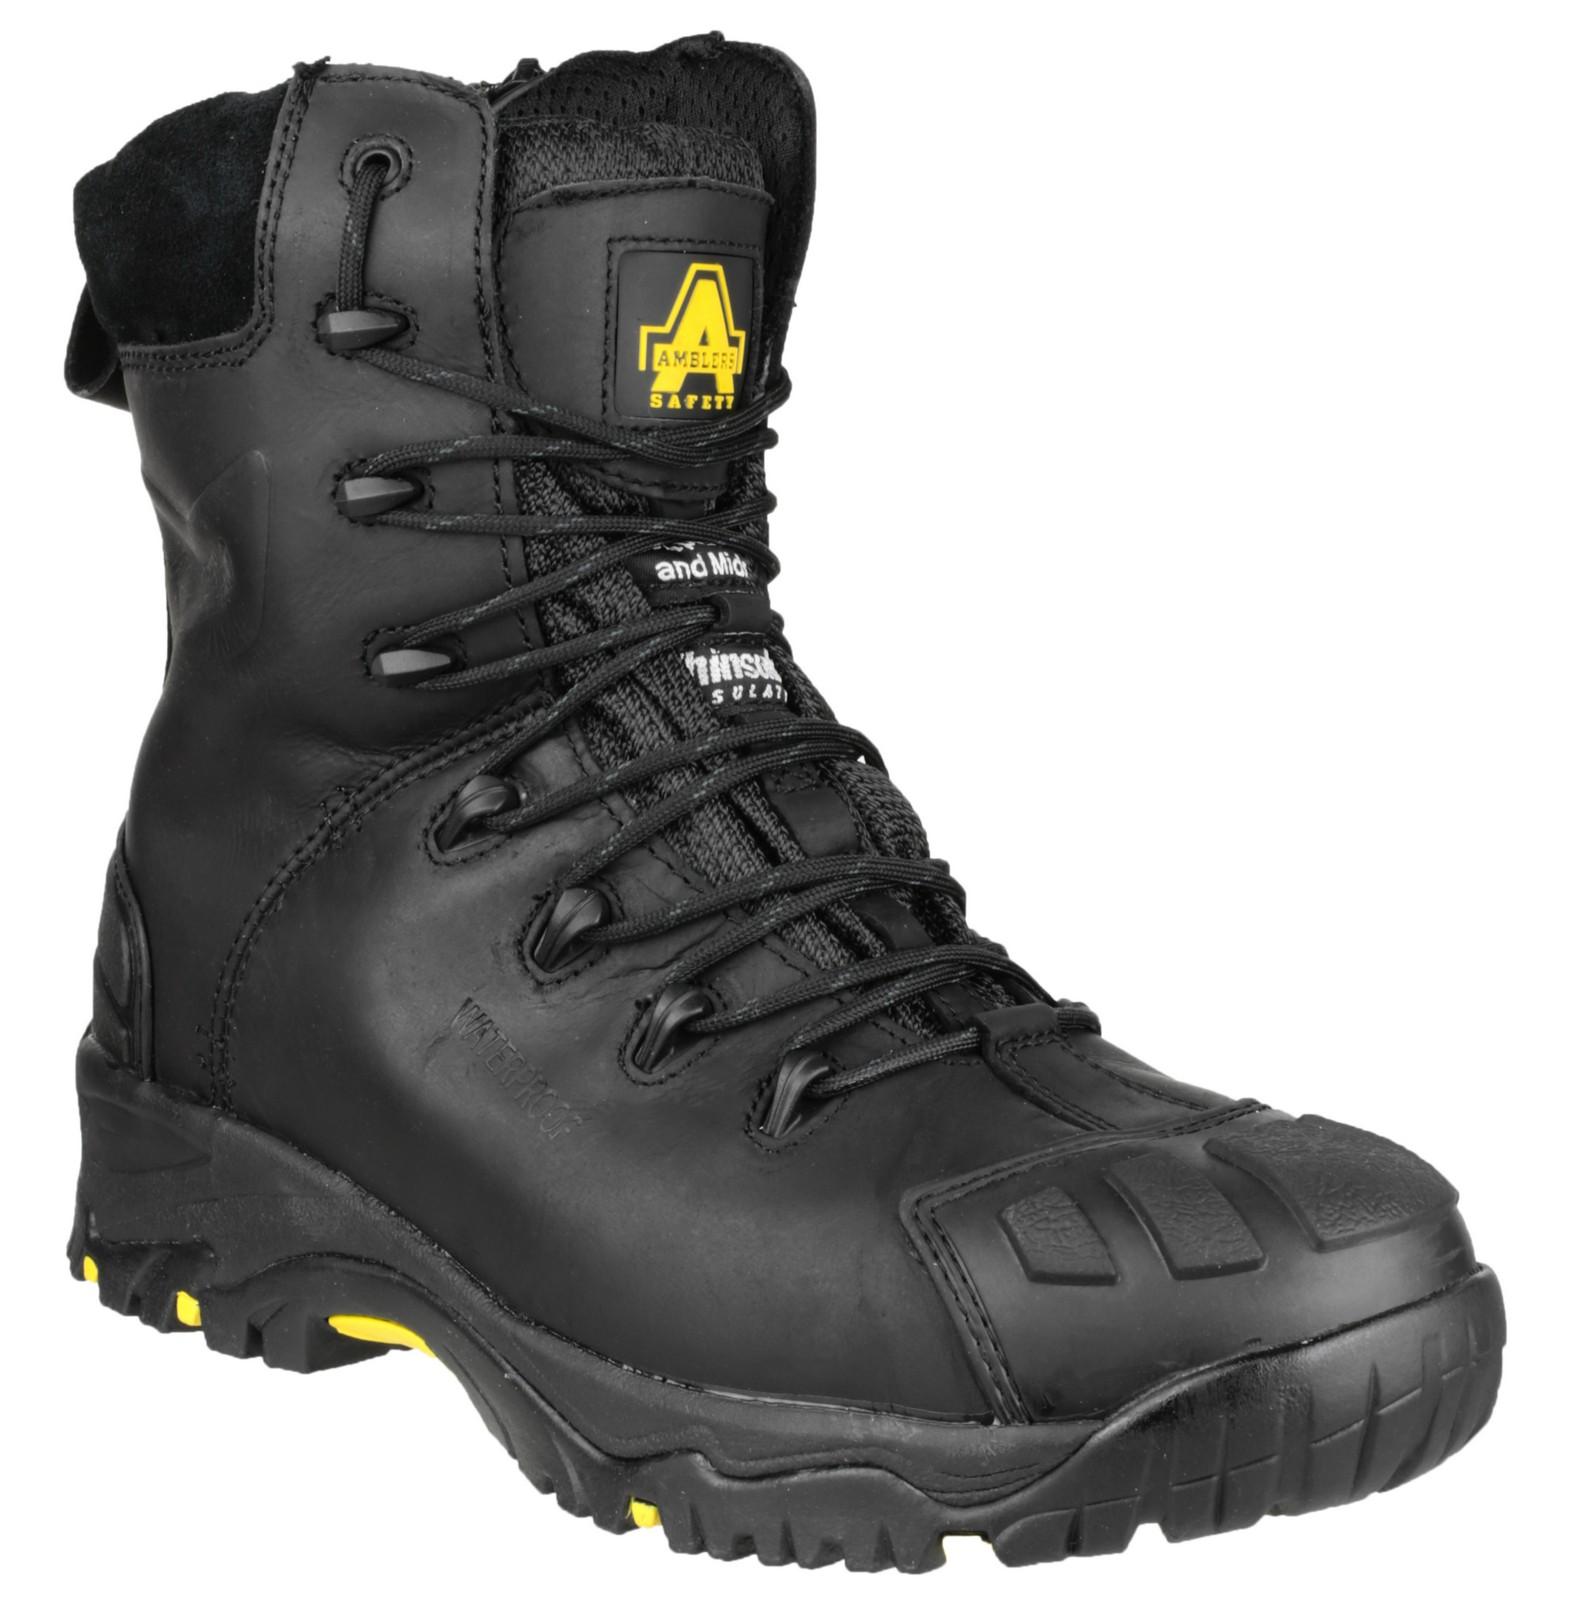 1da27bd3478 Amblers FS999 Waterproof Side Zip Composite Toe Cap S3 Safety Combat Work  Boots